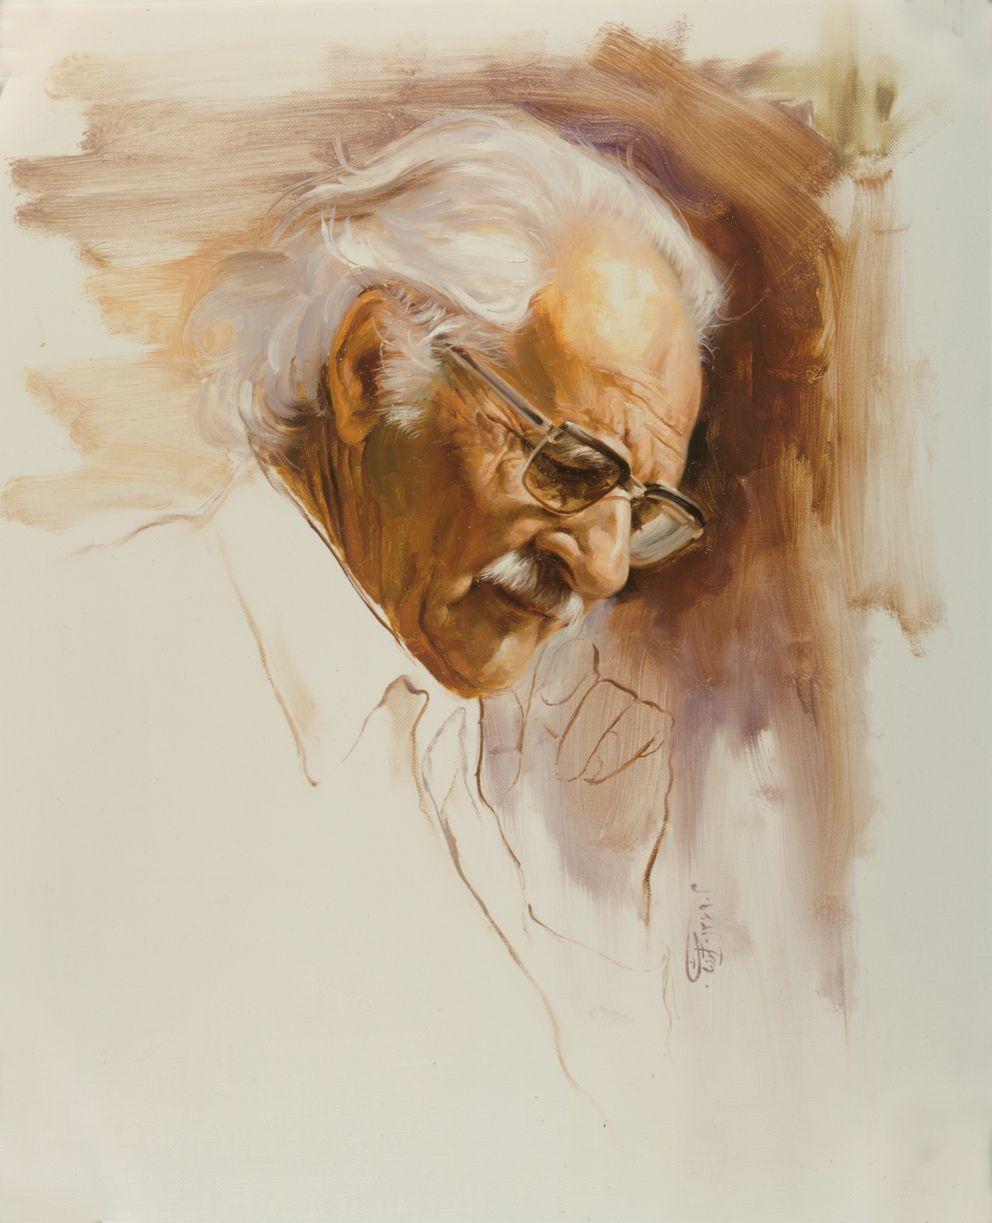 Ali Akbar Sanati.(Painter & Scuplptror).(1990) by artist Morteza Katouzian.